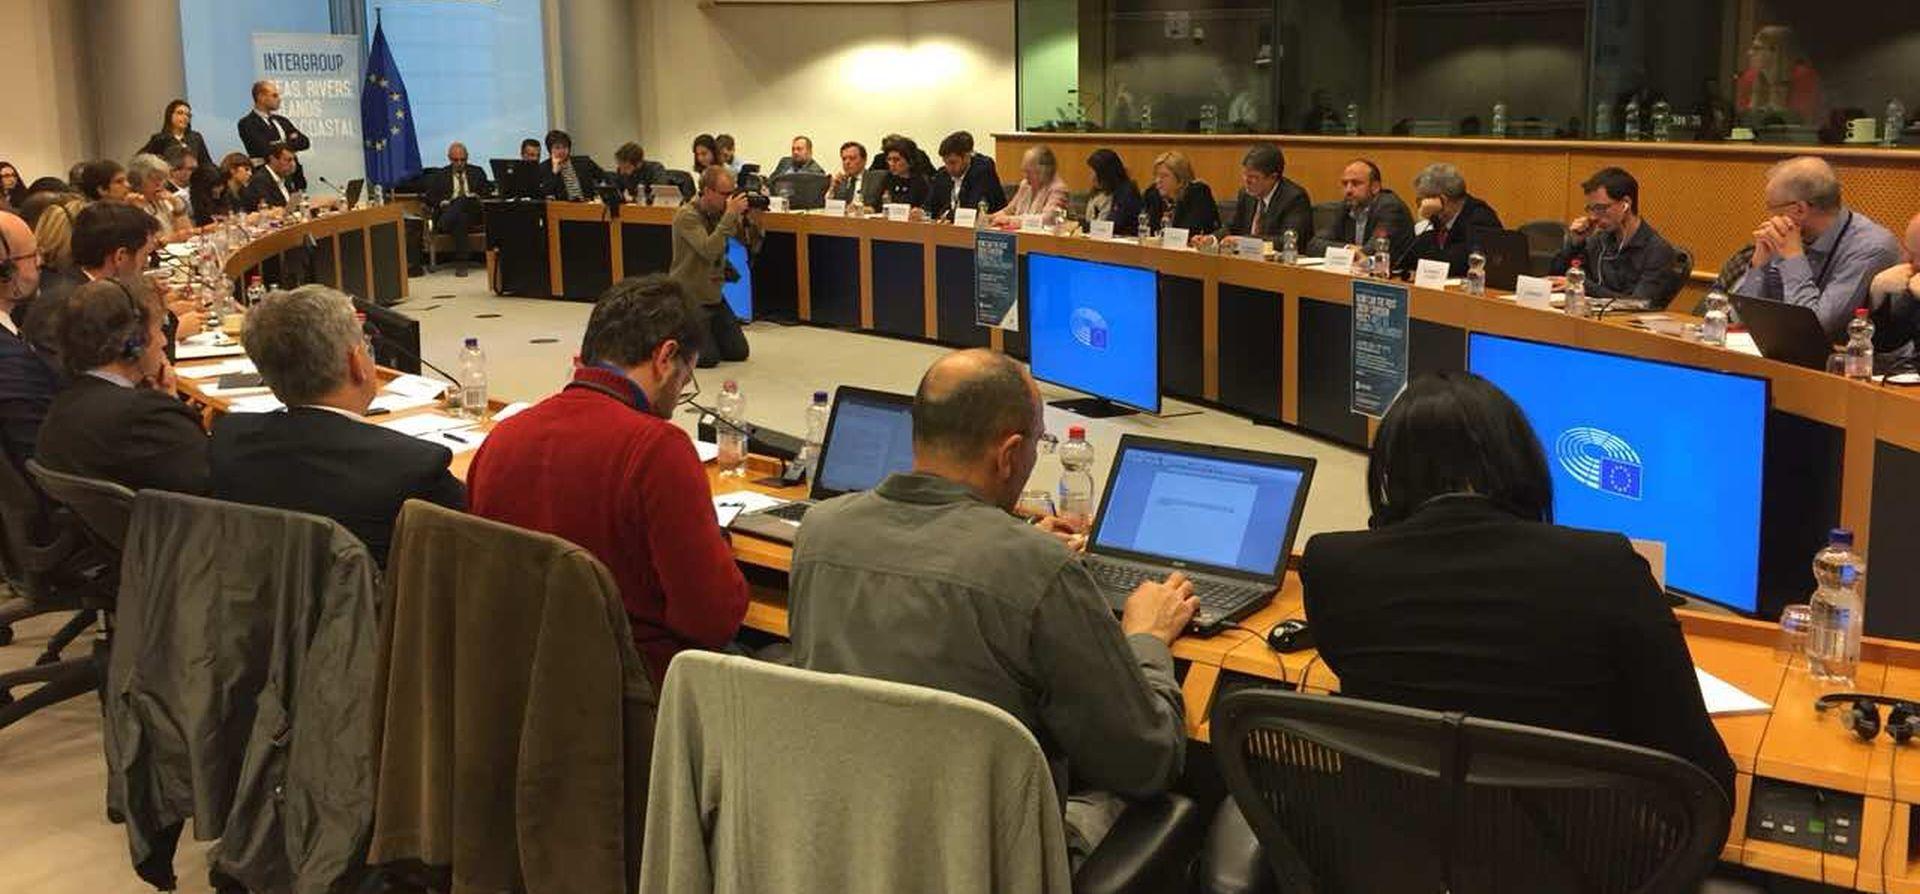 Picula organizirao konferenciju o budućnosti EU otoka